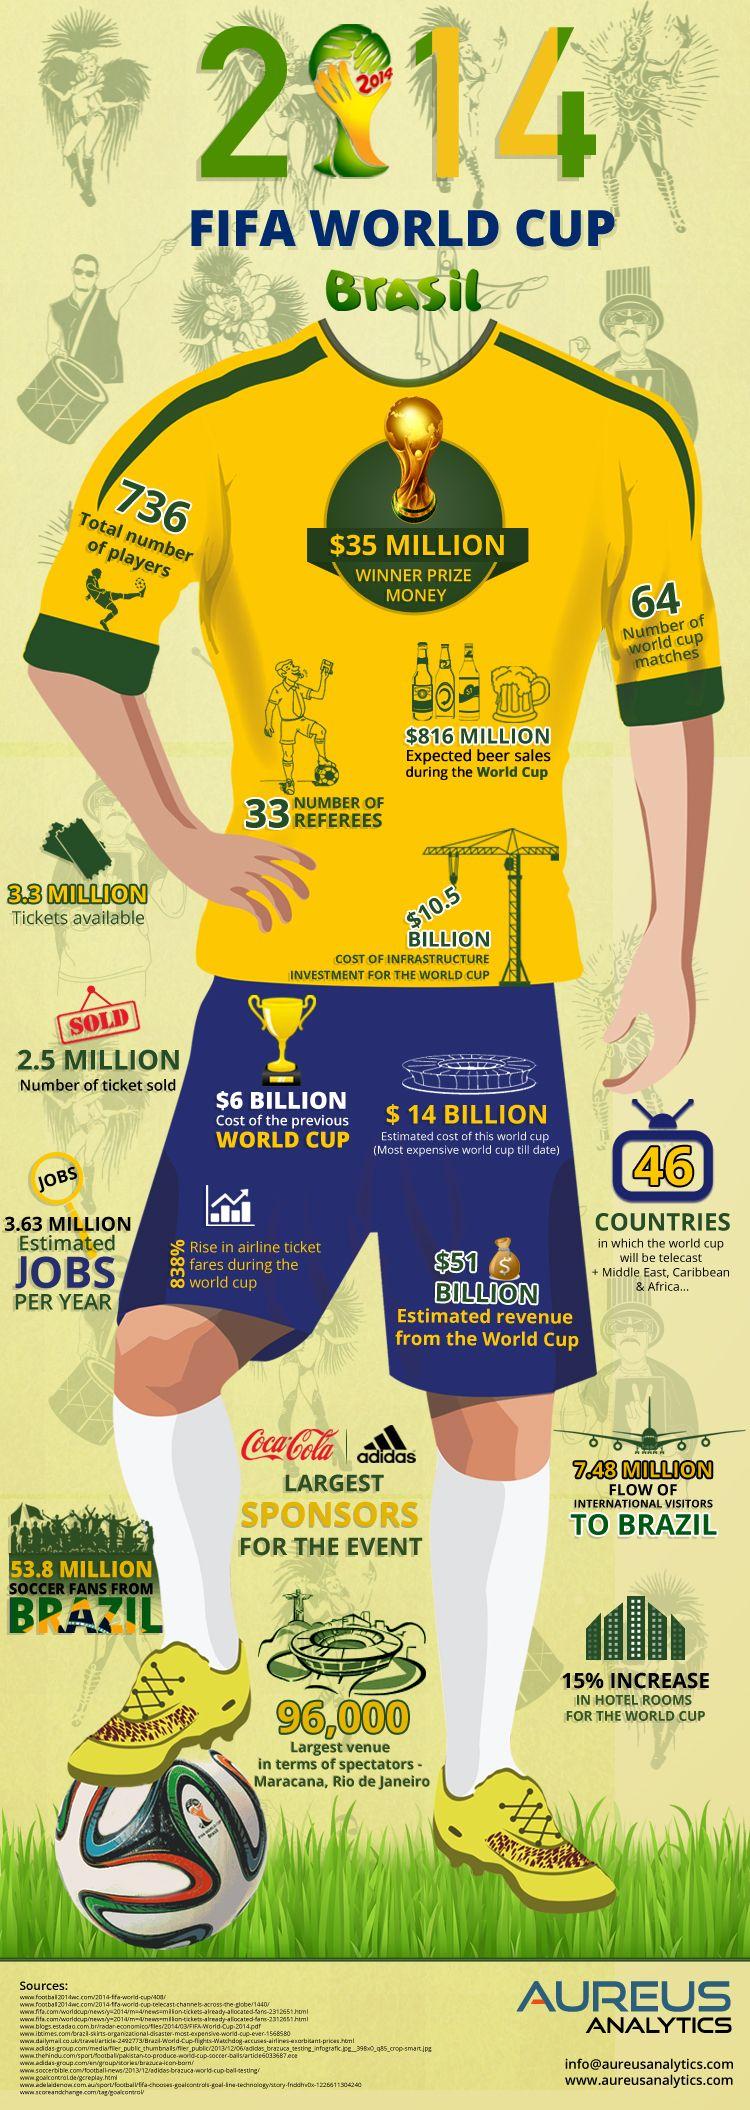 AureusFIFAWCBrazilinNumbers FIFA World Cup World